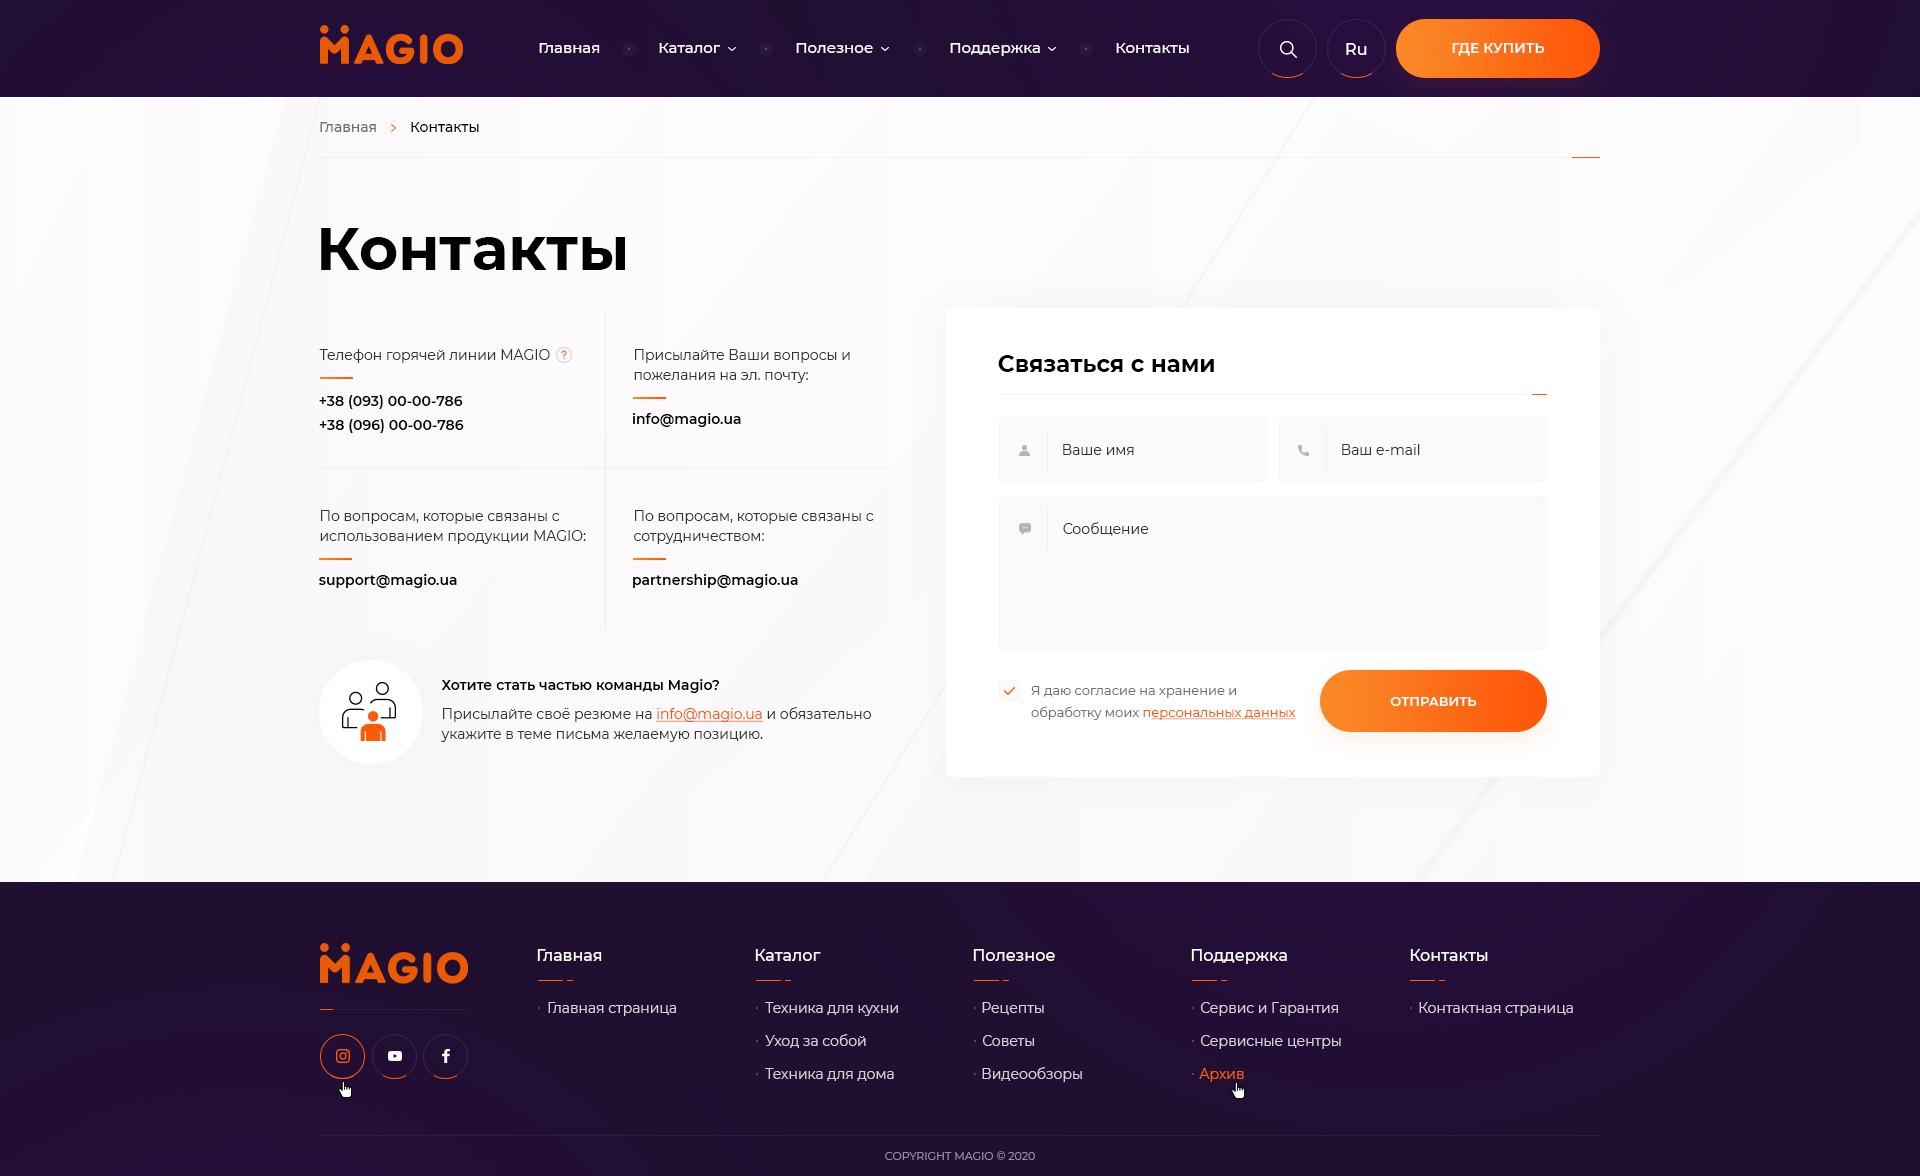 Magio_16_Catalog_Page_1.0